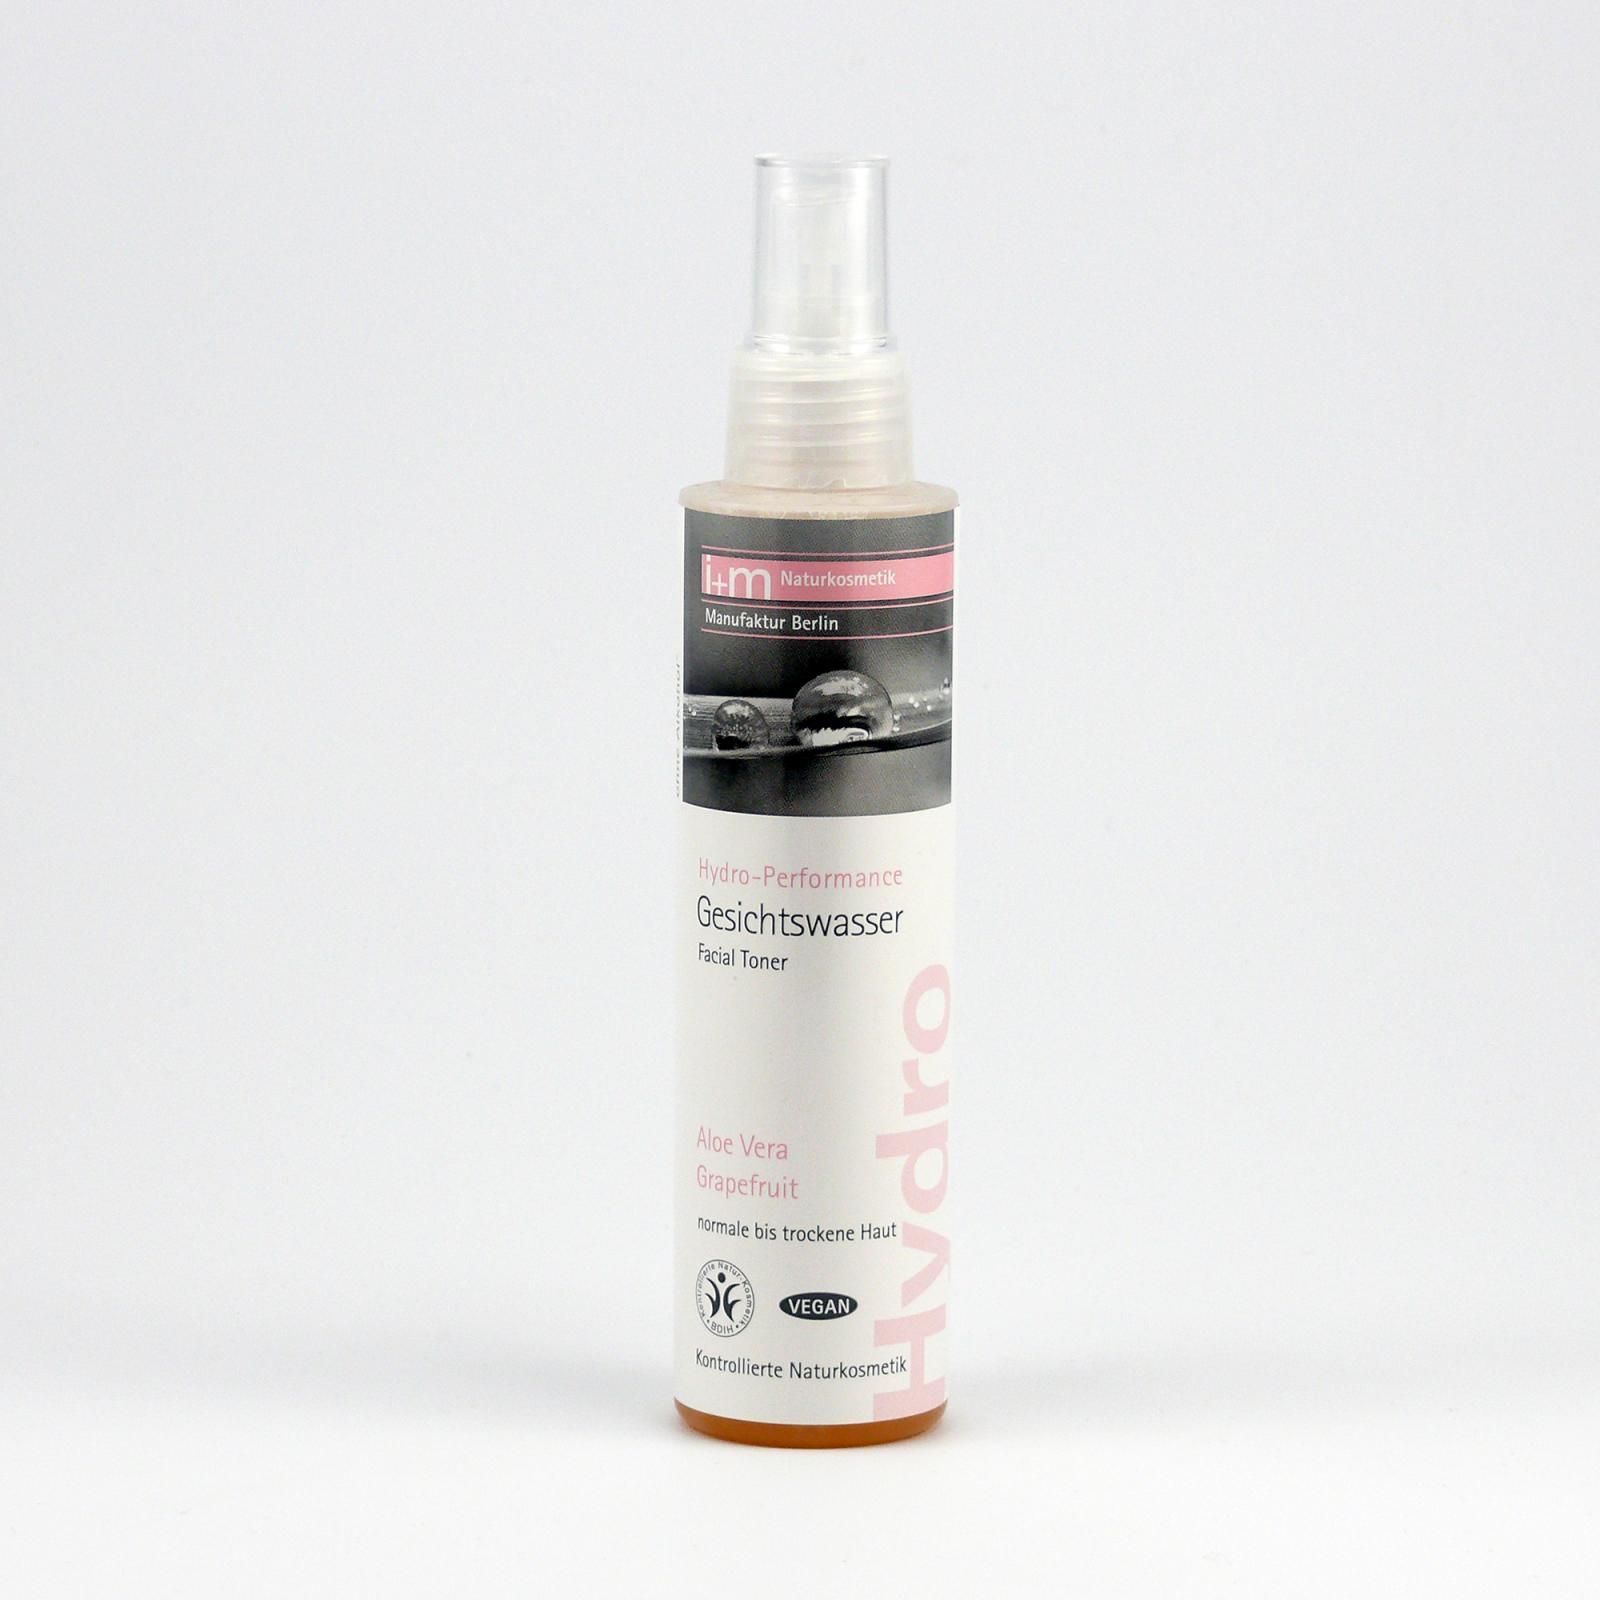 I+M Naturkosmetik Pleťová voda Hydro-Performance 150 ml